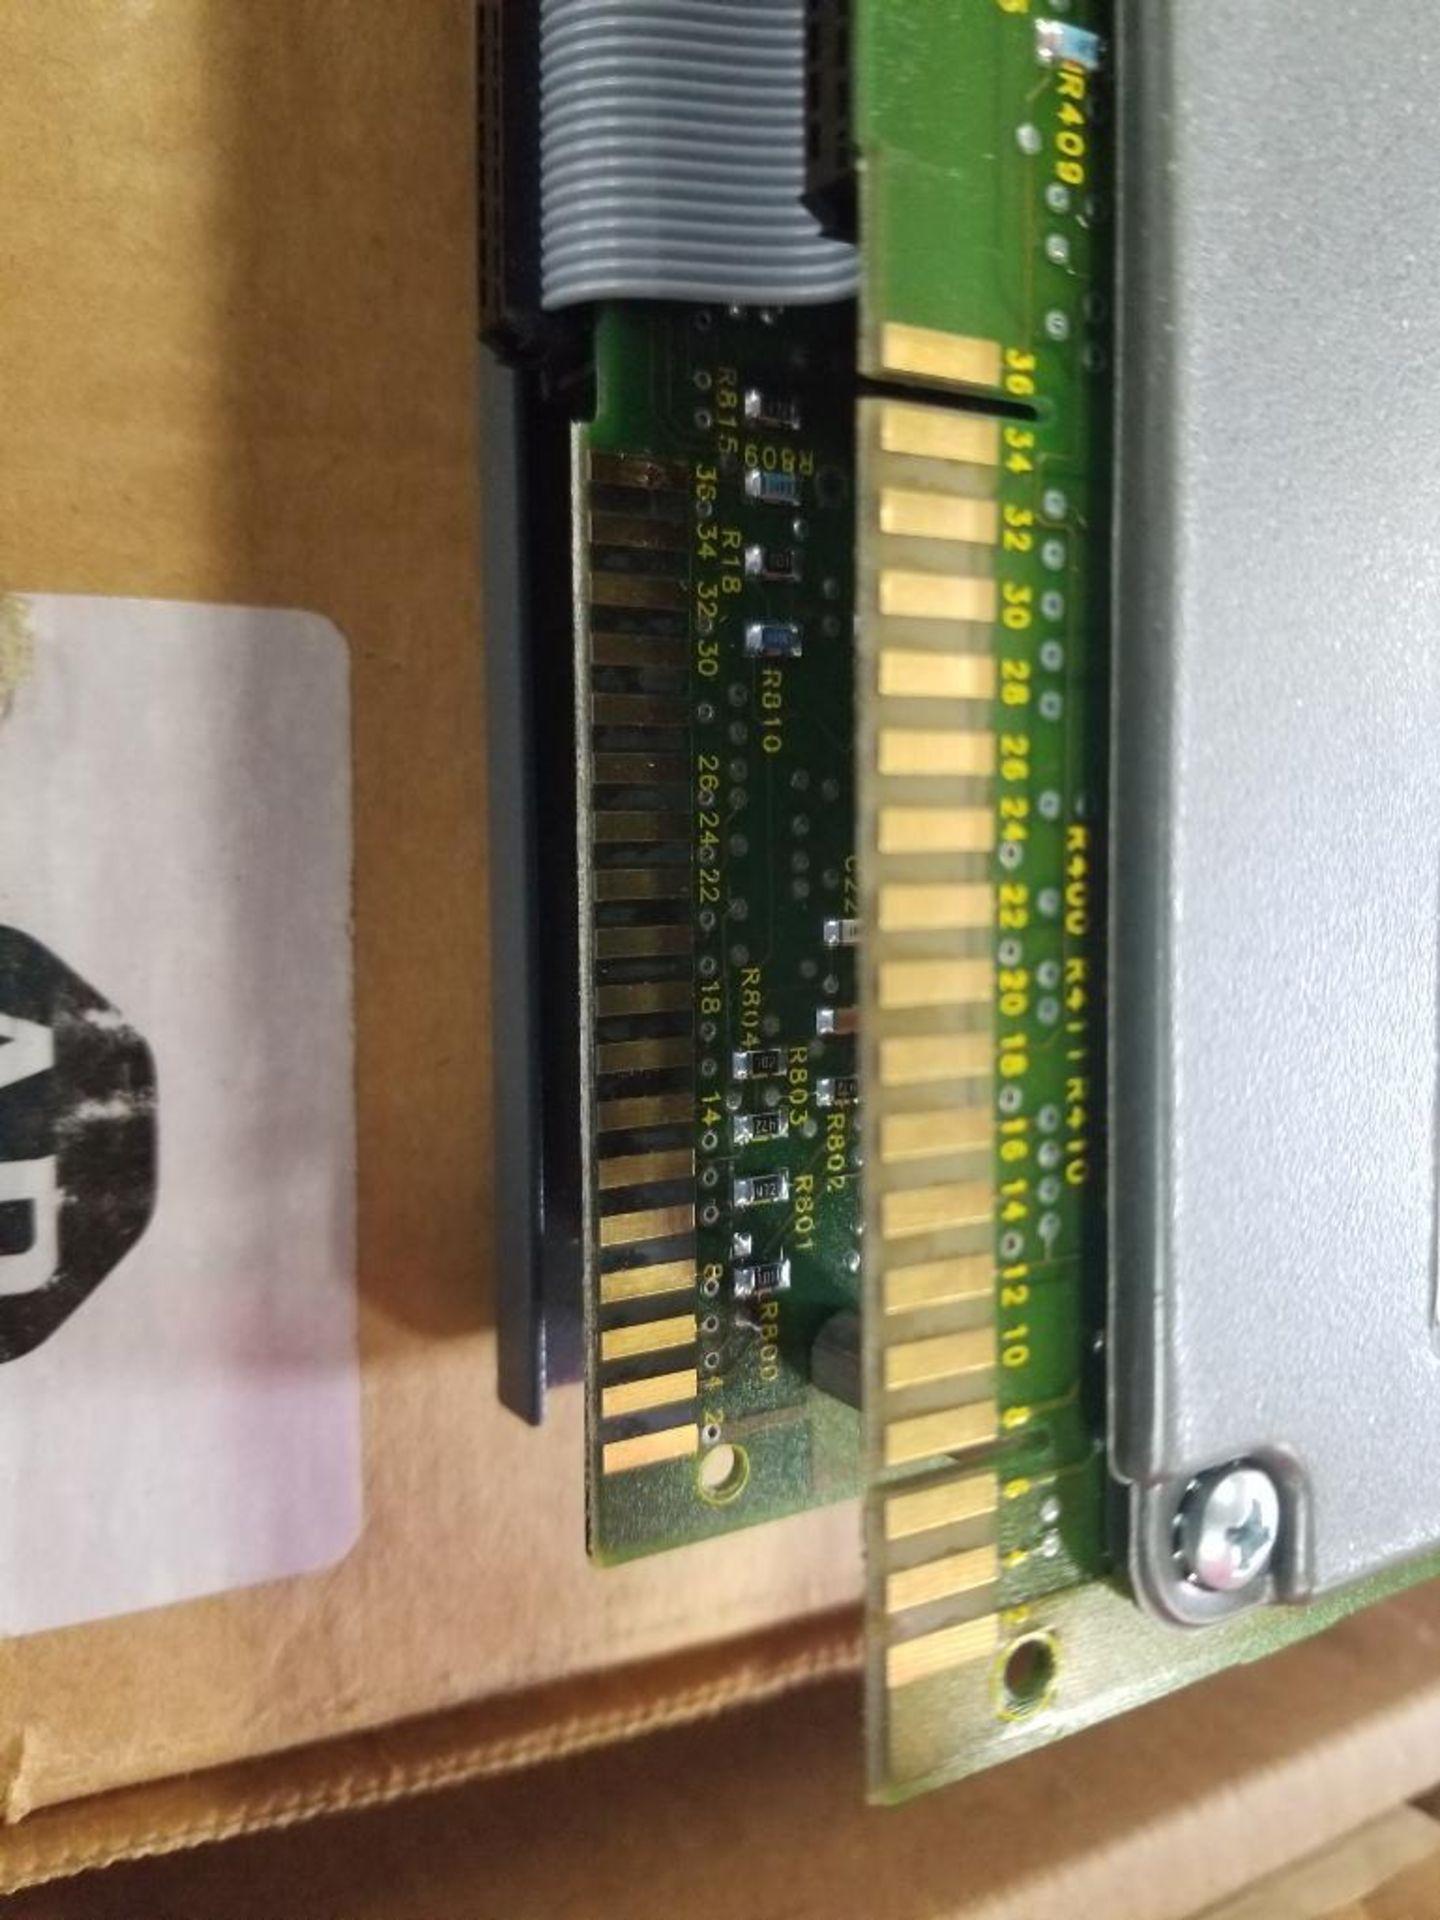 Allen Bradley flexible interface module. Catalog 2760-RB. New in box. - Image 4 of 5